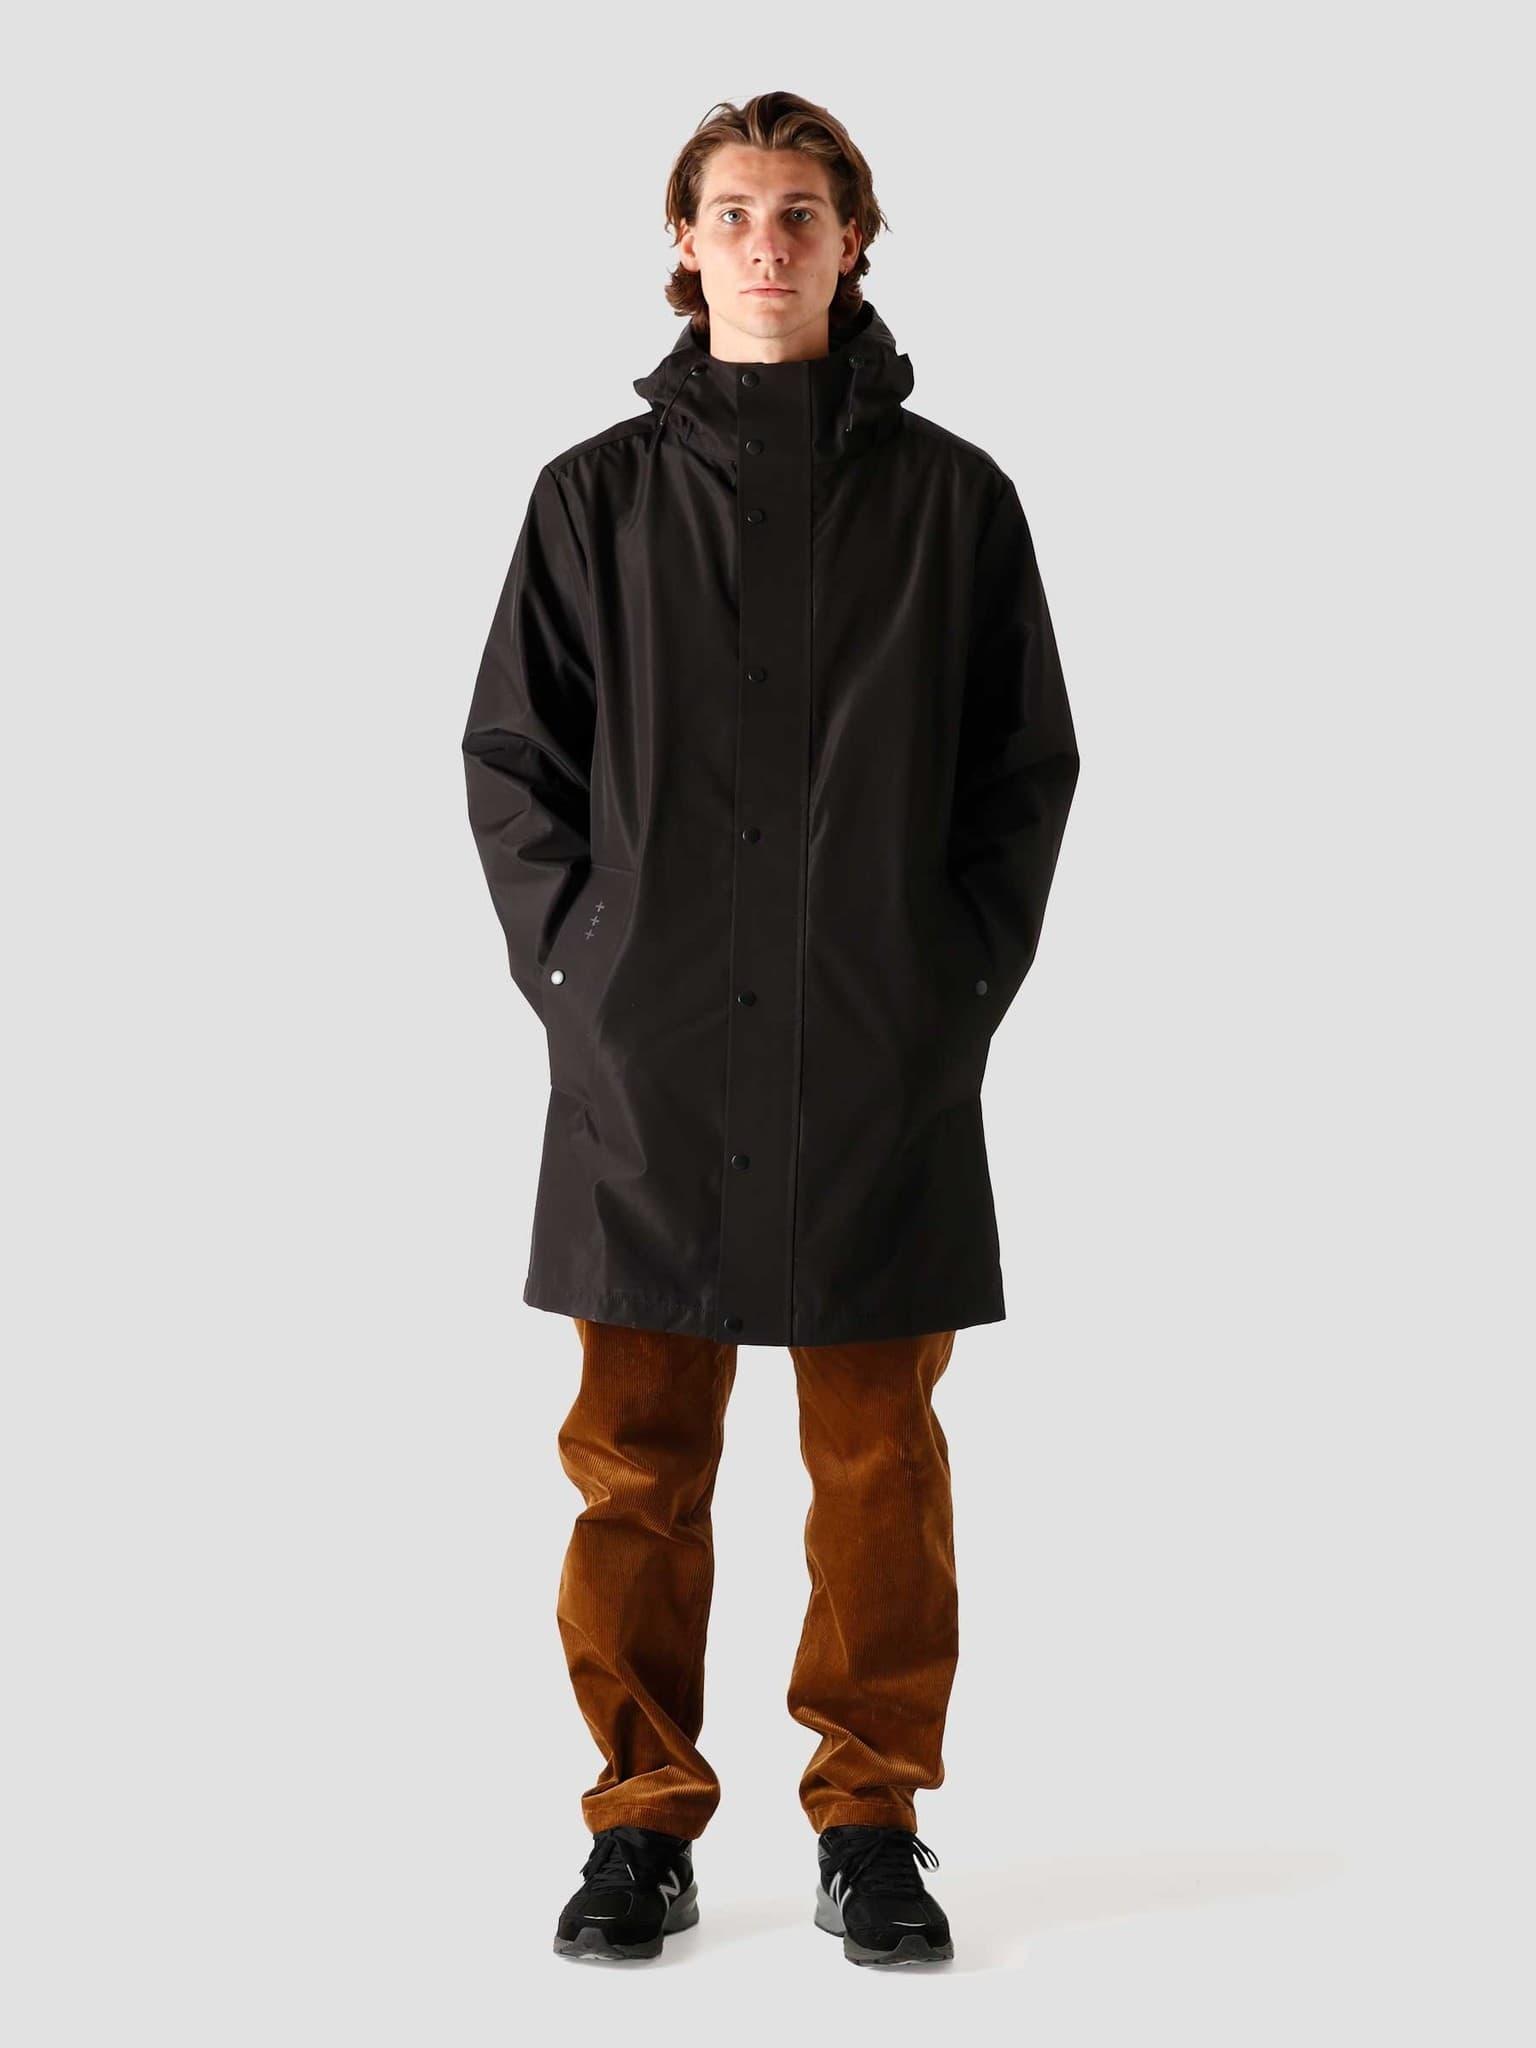 QB220 Rain Coat Black